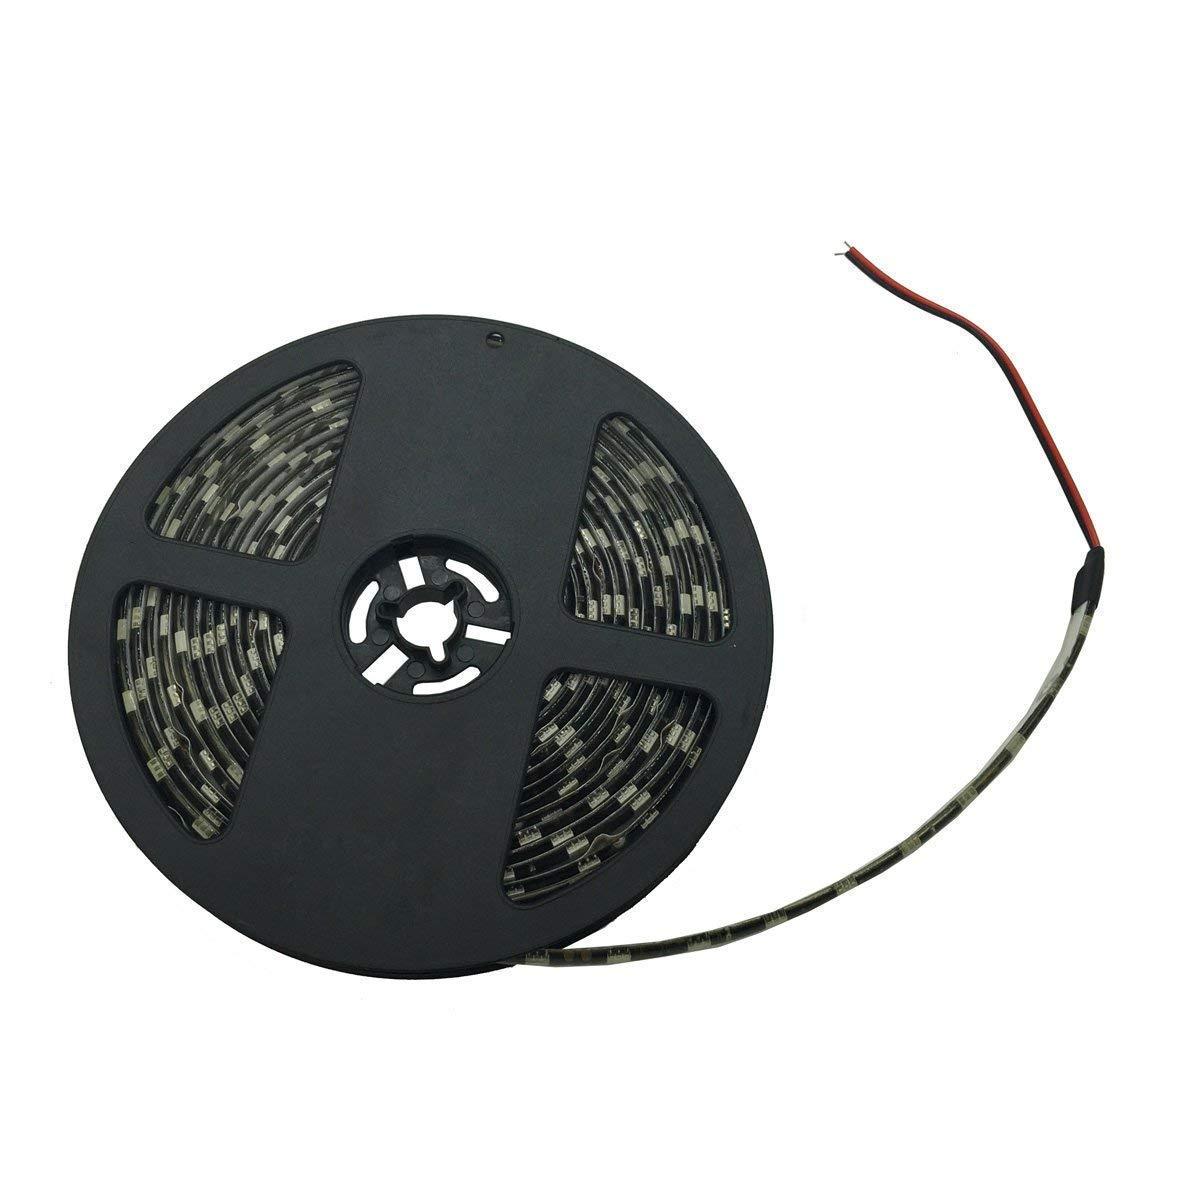 Yolu 1pcs 5 Meter Waterproof LED Strip Lights Kits 300SMD 5050 Black+Ice Blue